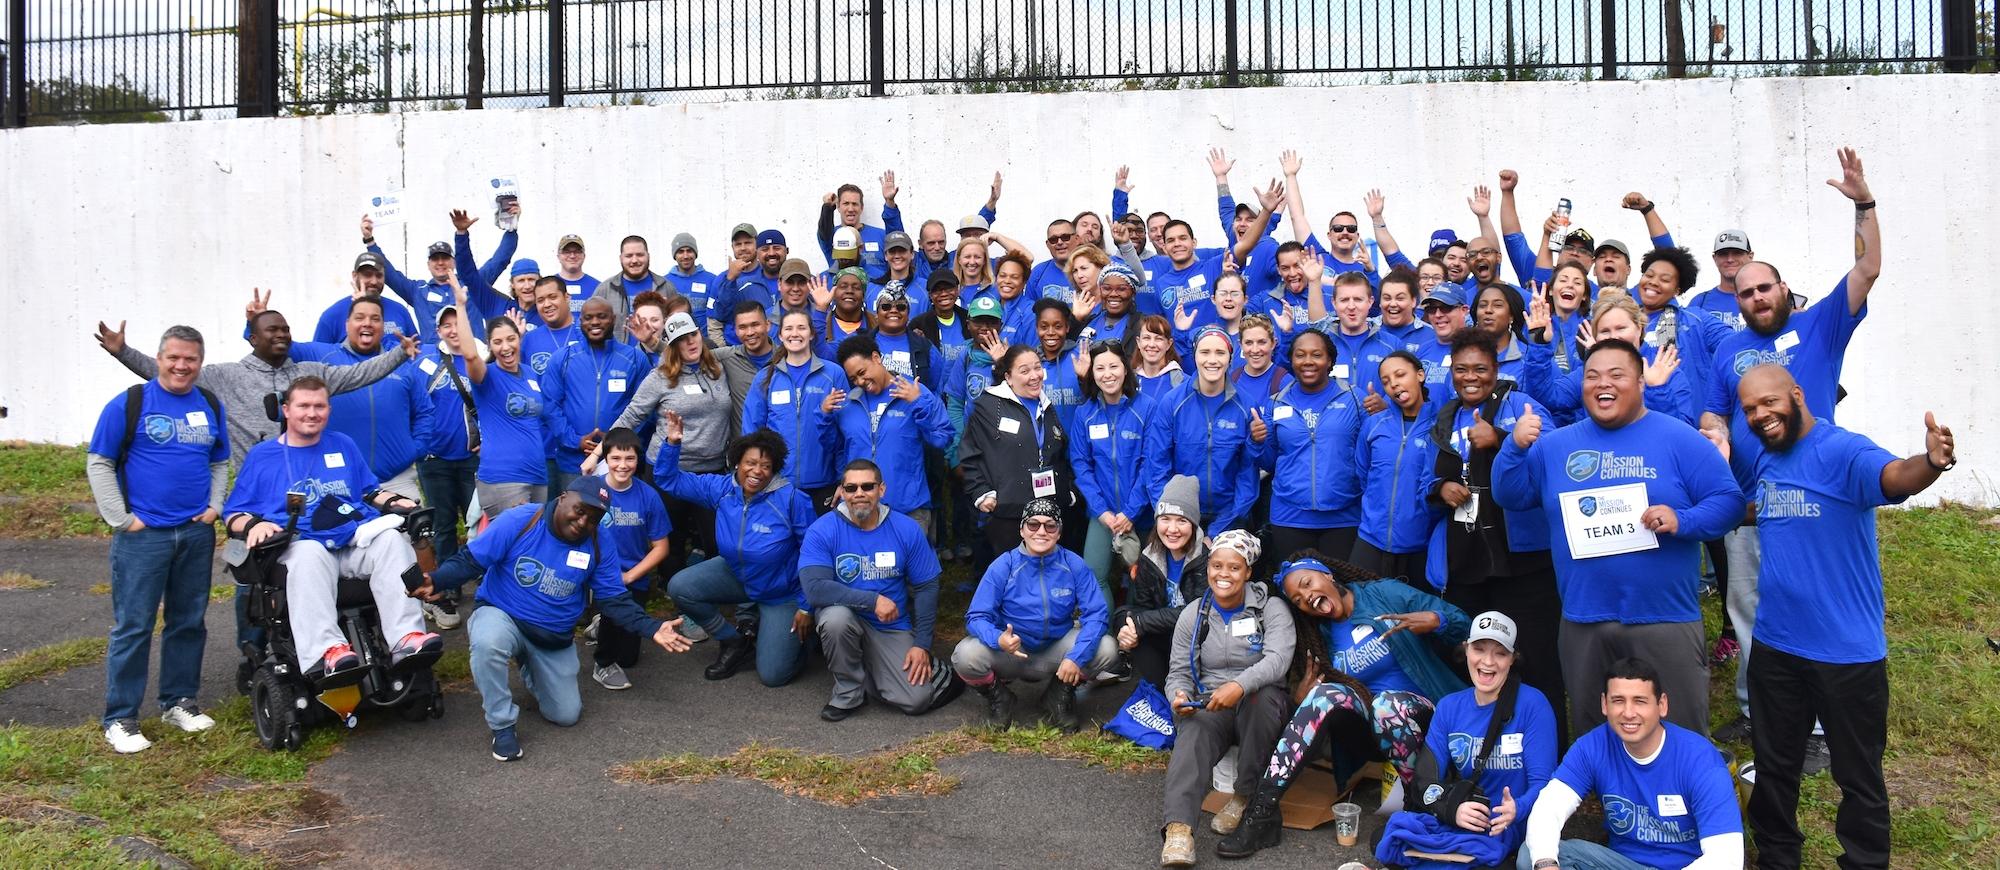 New Program, Service Leadership Corps Kicks Off in Newark